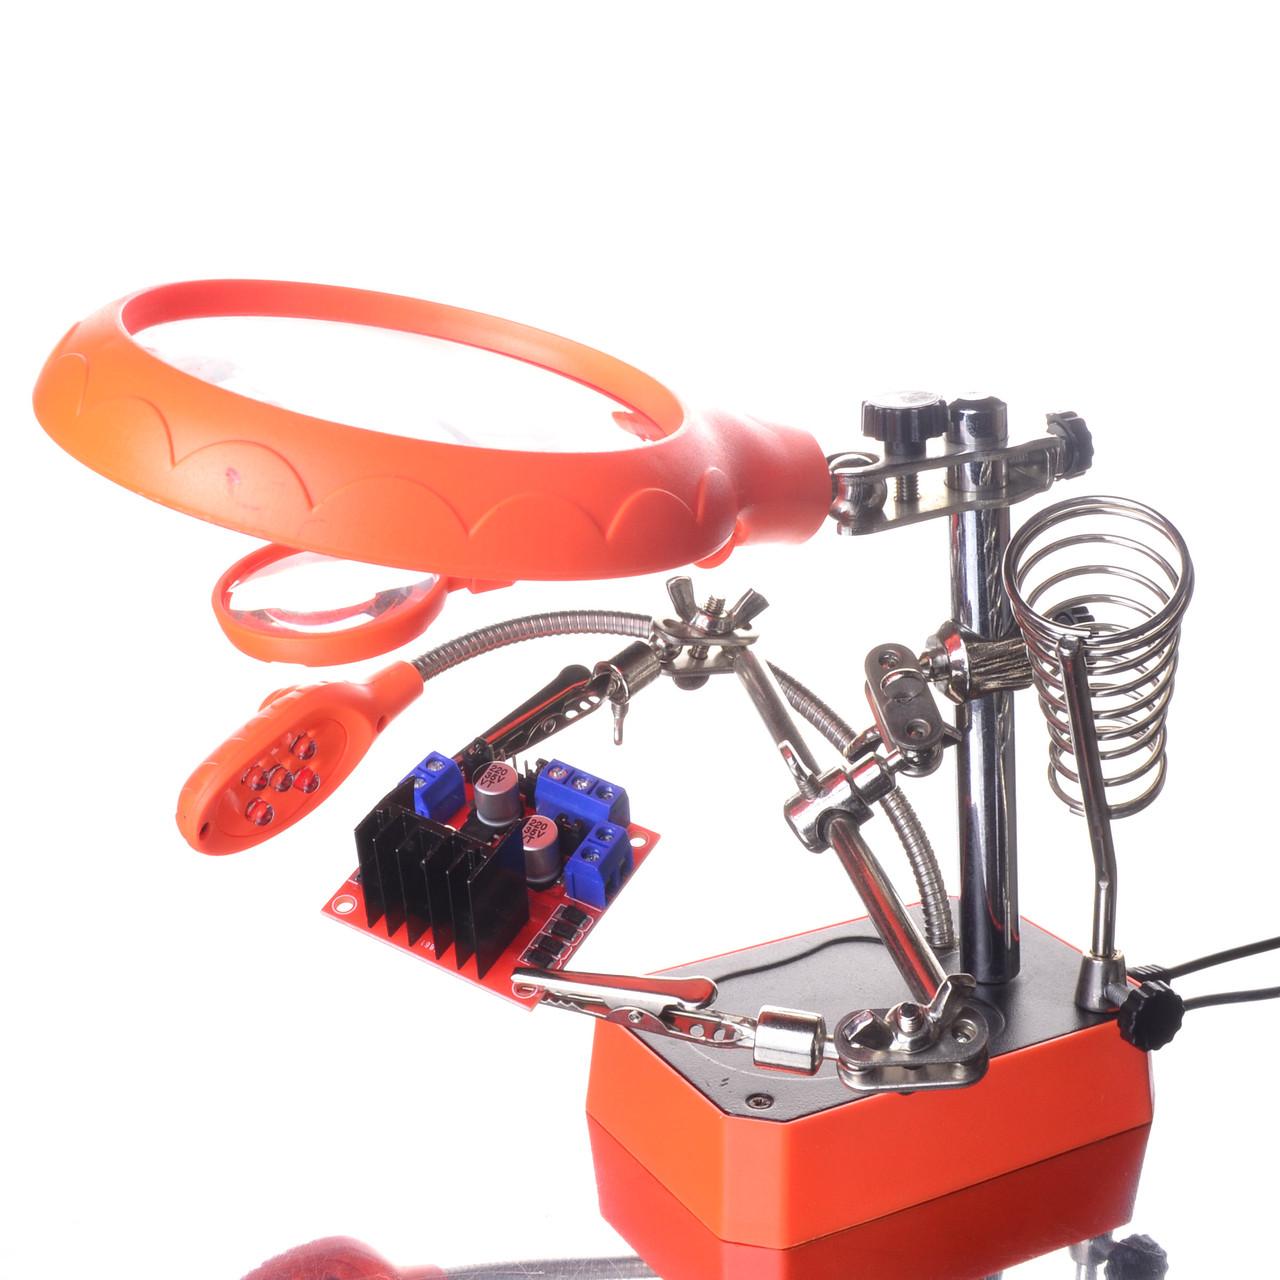 Третья рука для пайки TE-800 Orange (MG16129-C) держатель плат, лупа 90мм, Led подсветка